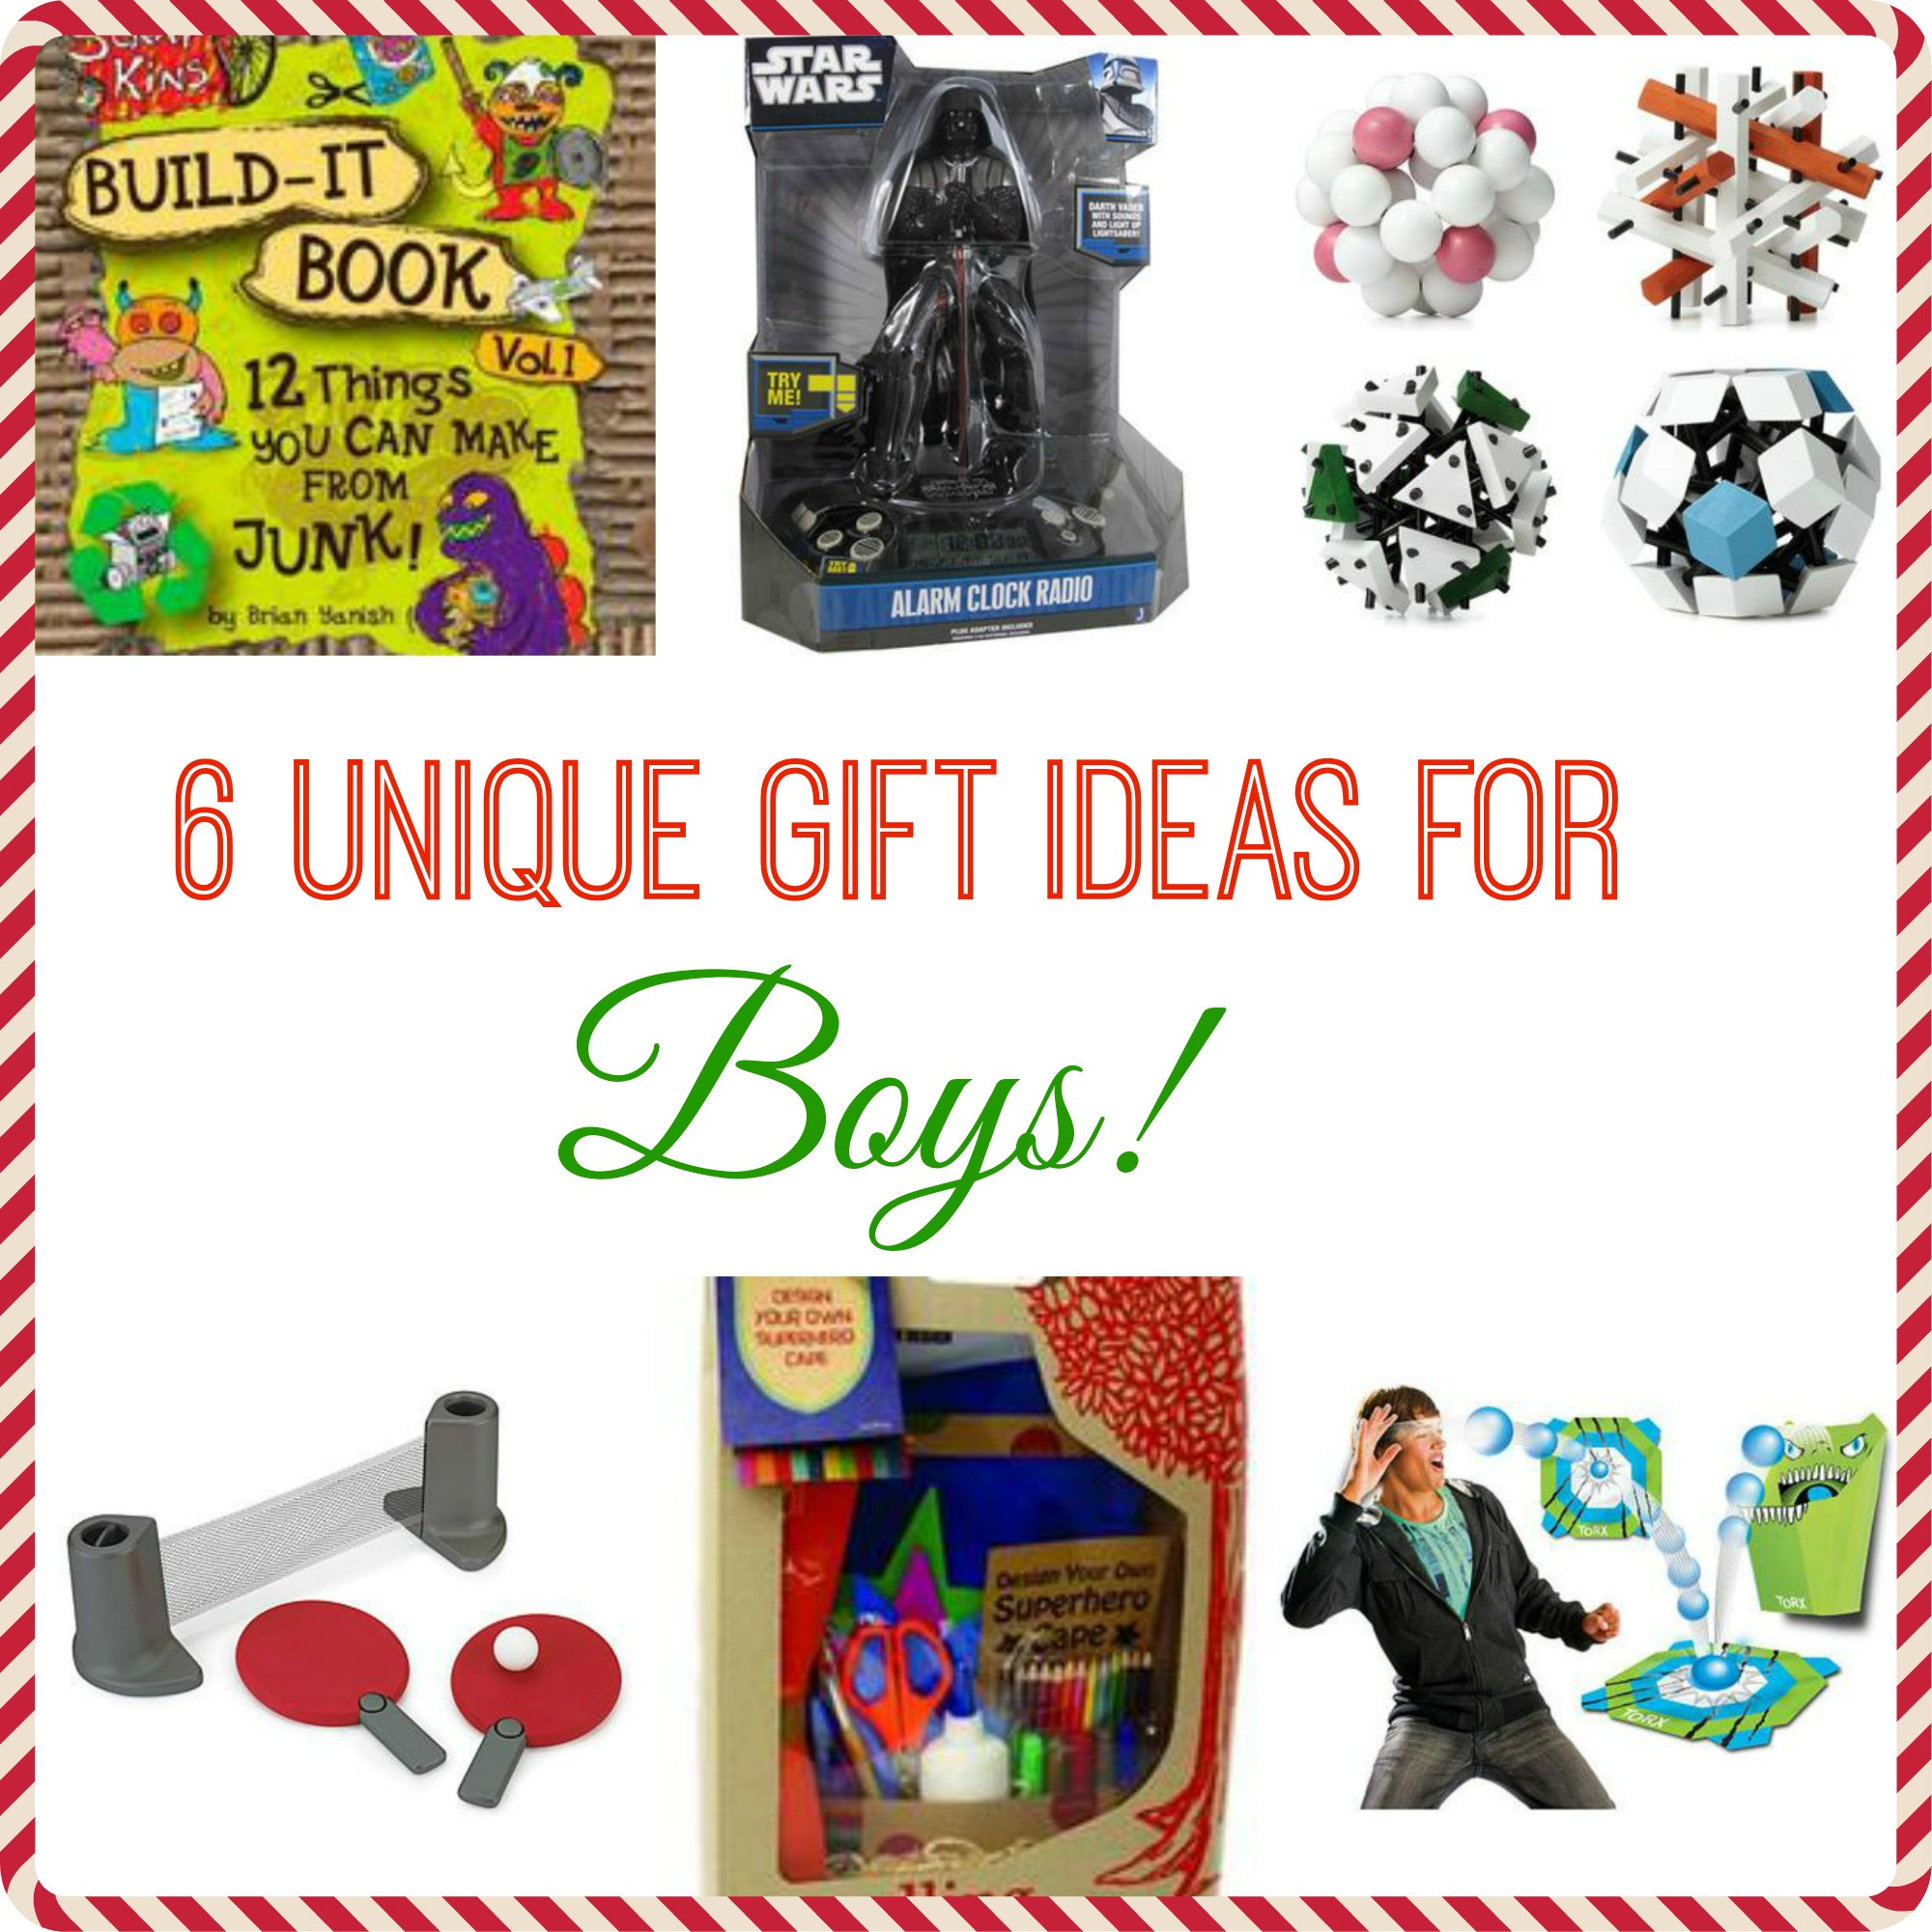 Unique Gift Ideas For Boys  6 Unique Gift Ideas for Boys